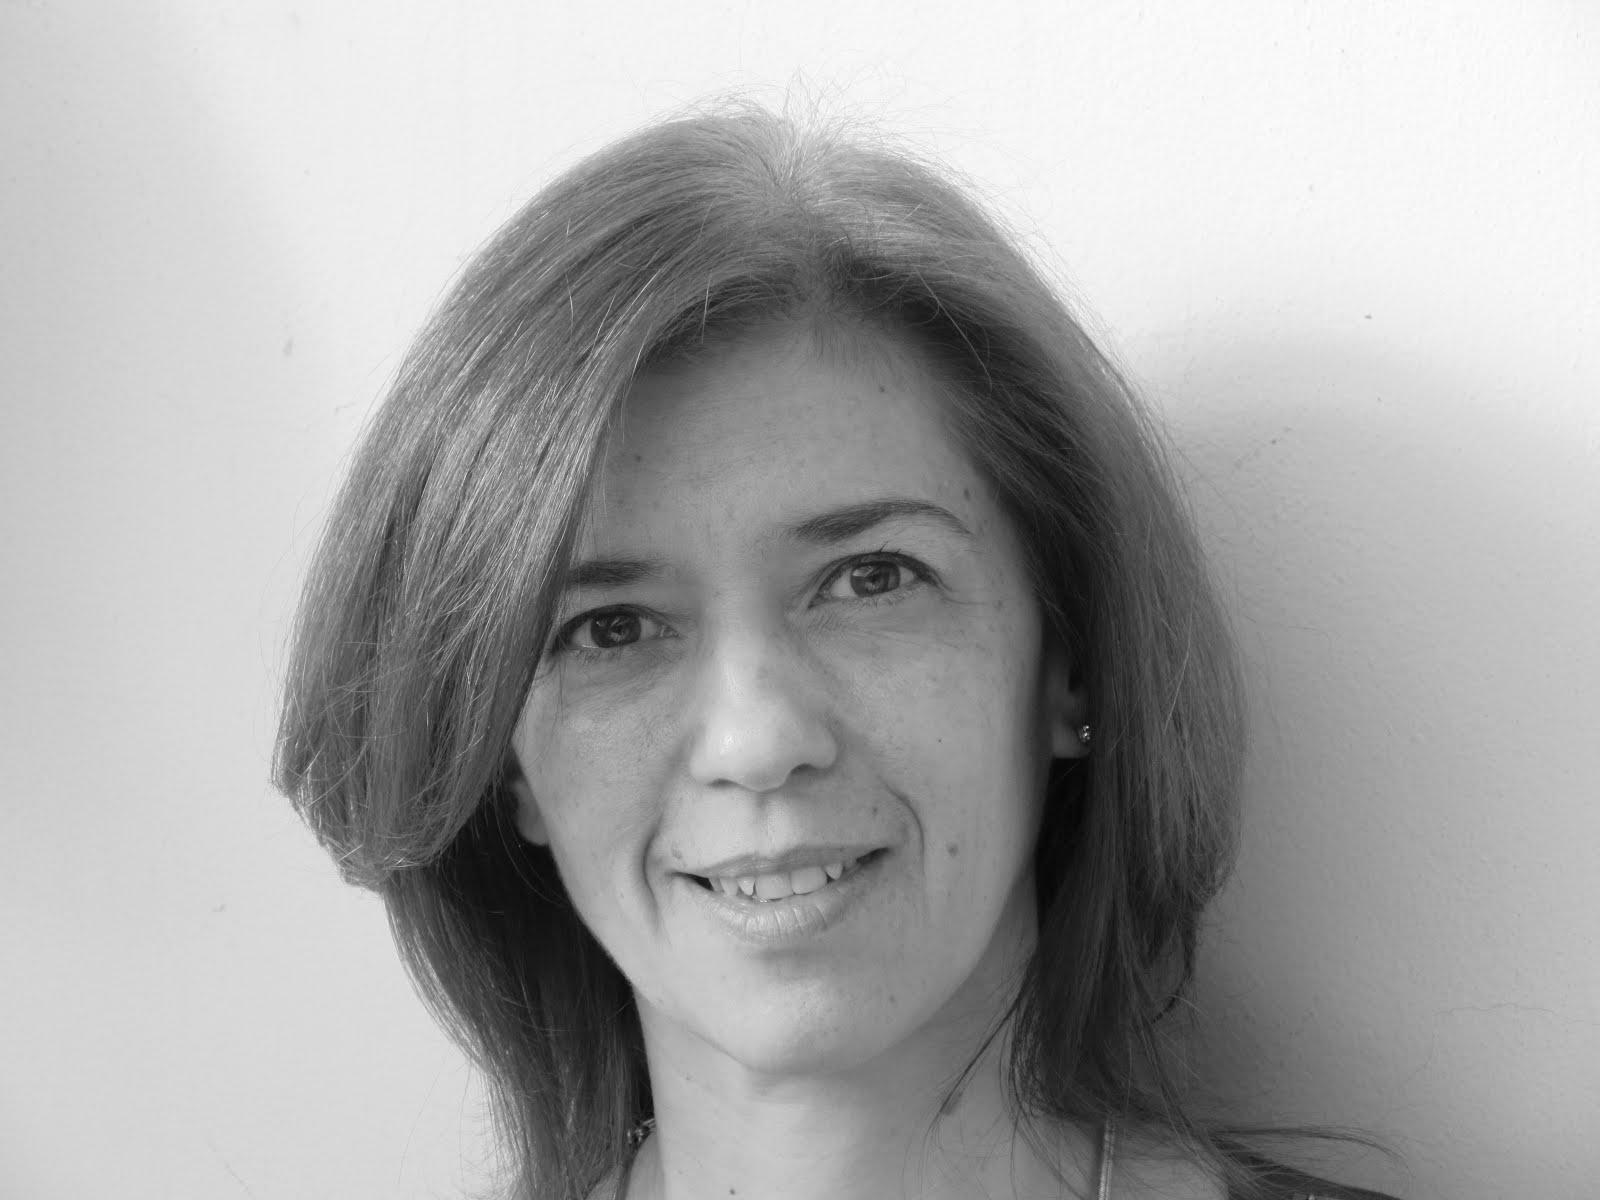 Natalia Solomonoff